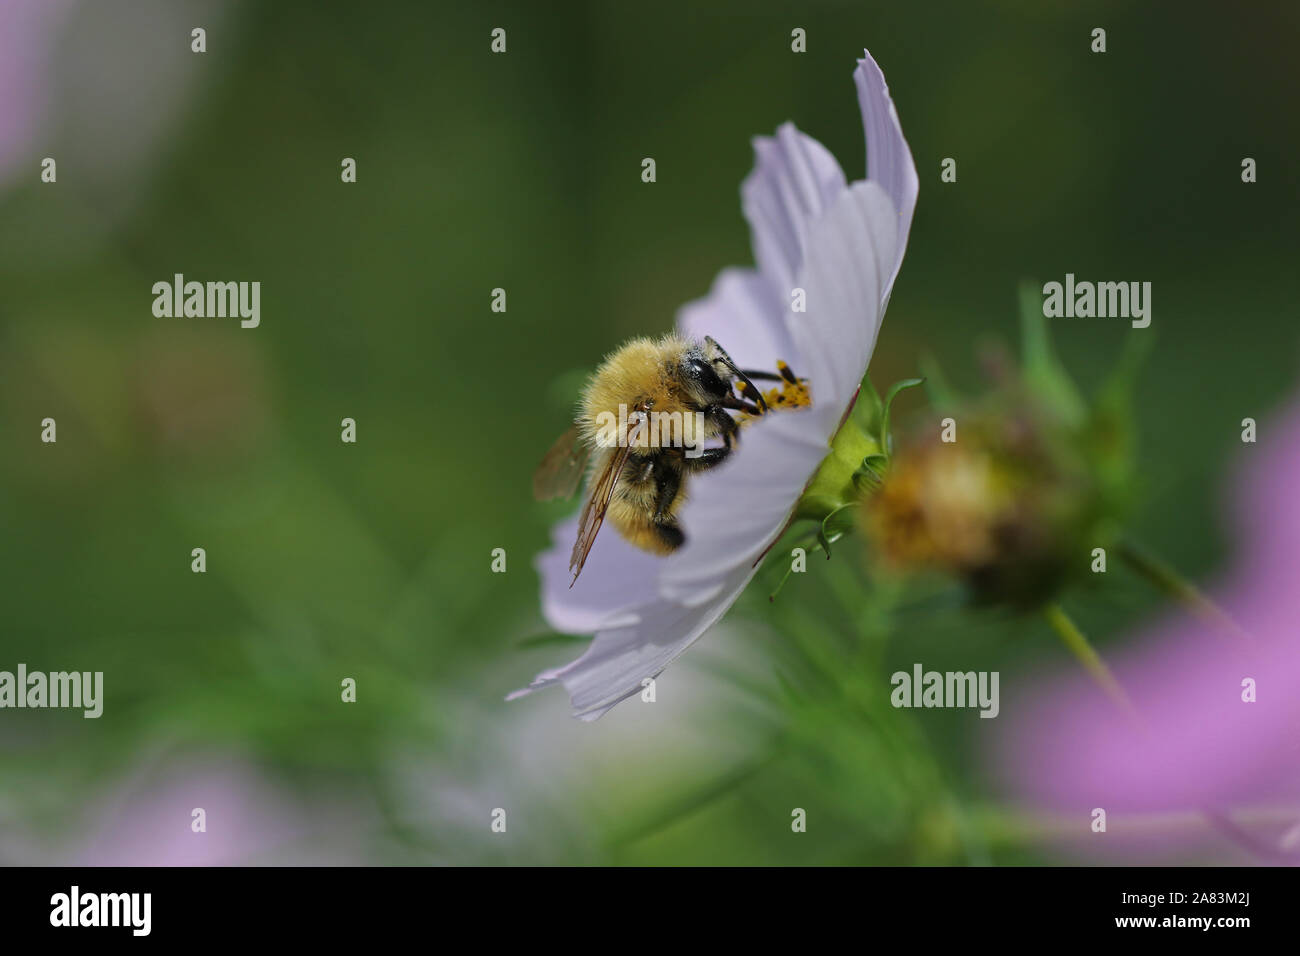 orange bee probably a cuckoo bee psithyrus barbutellis close up collecting pollen on a garden cosmos bipinnatus flower also called a Mexican aster Stock Photo